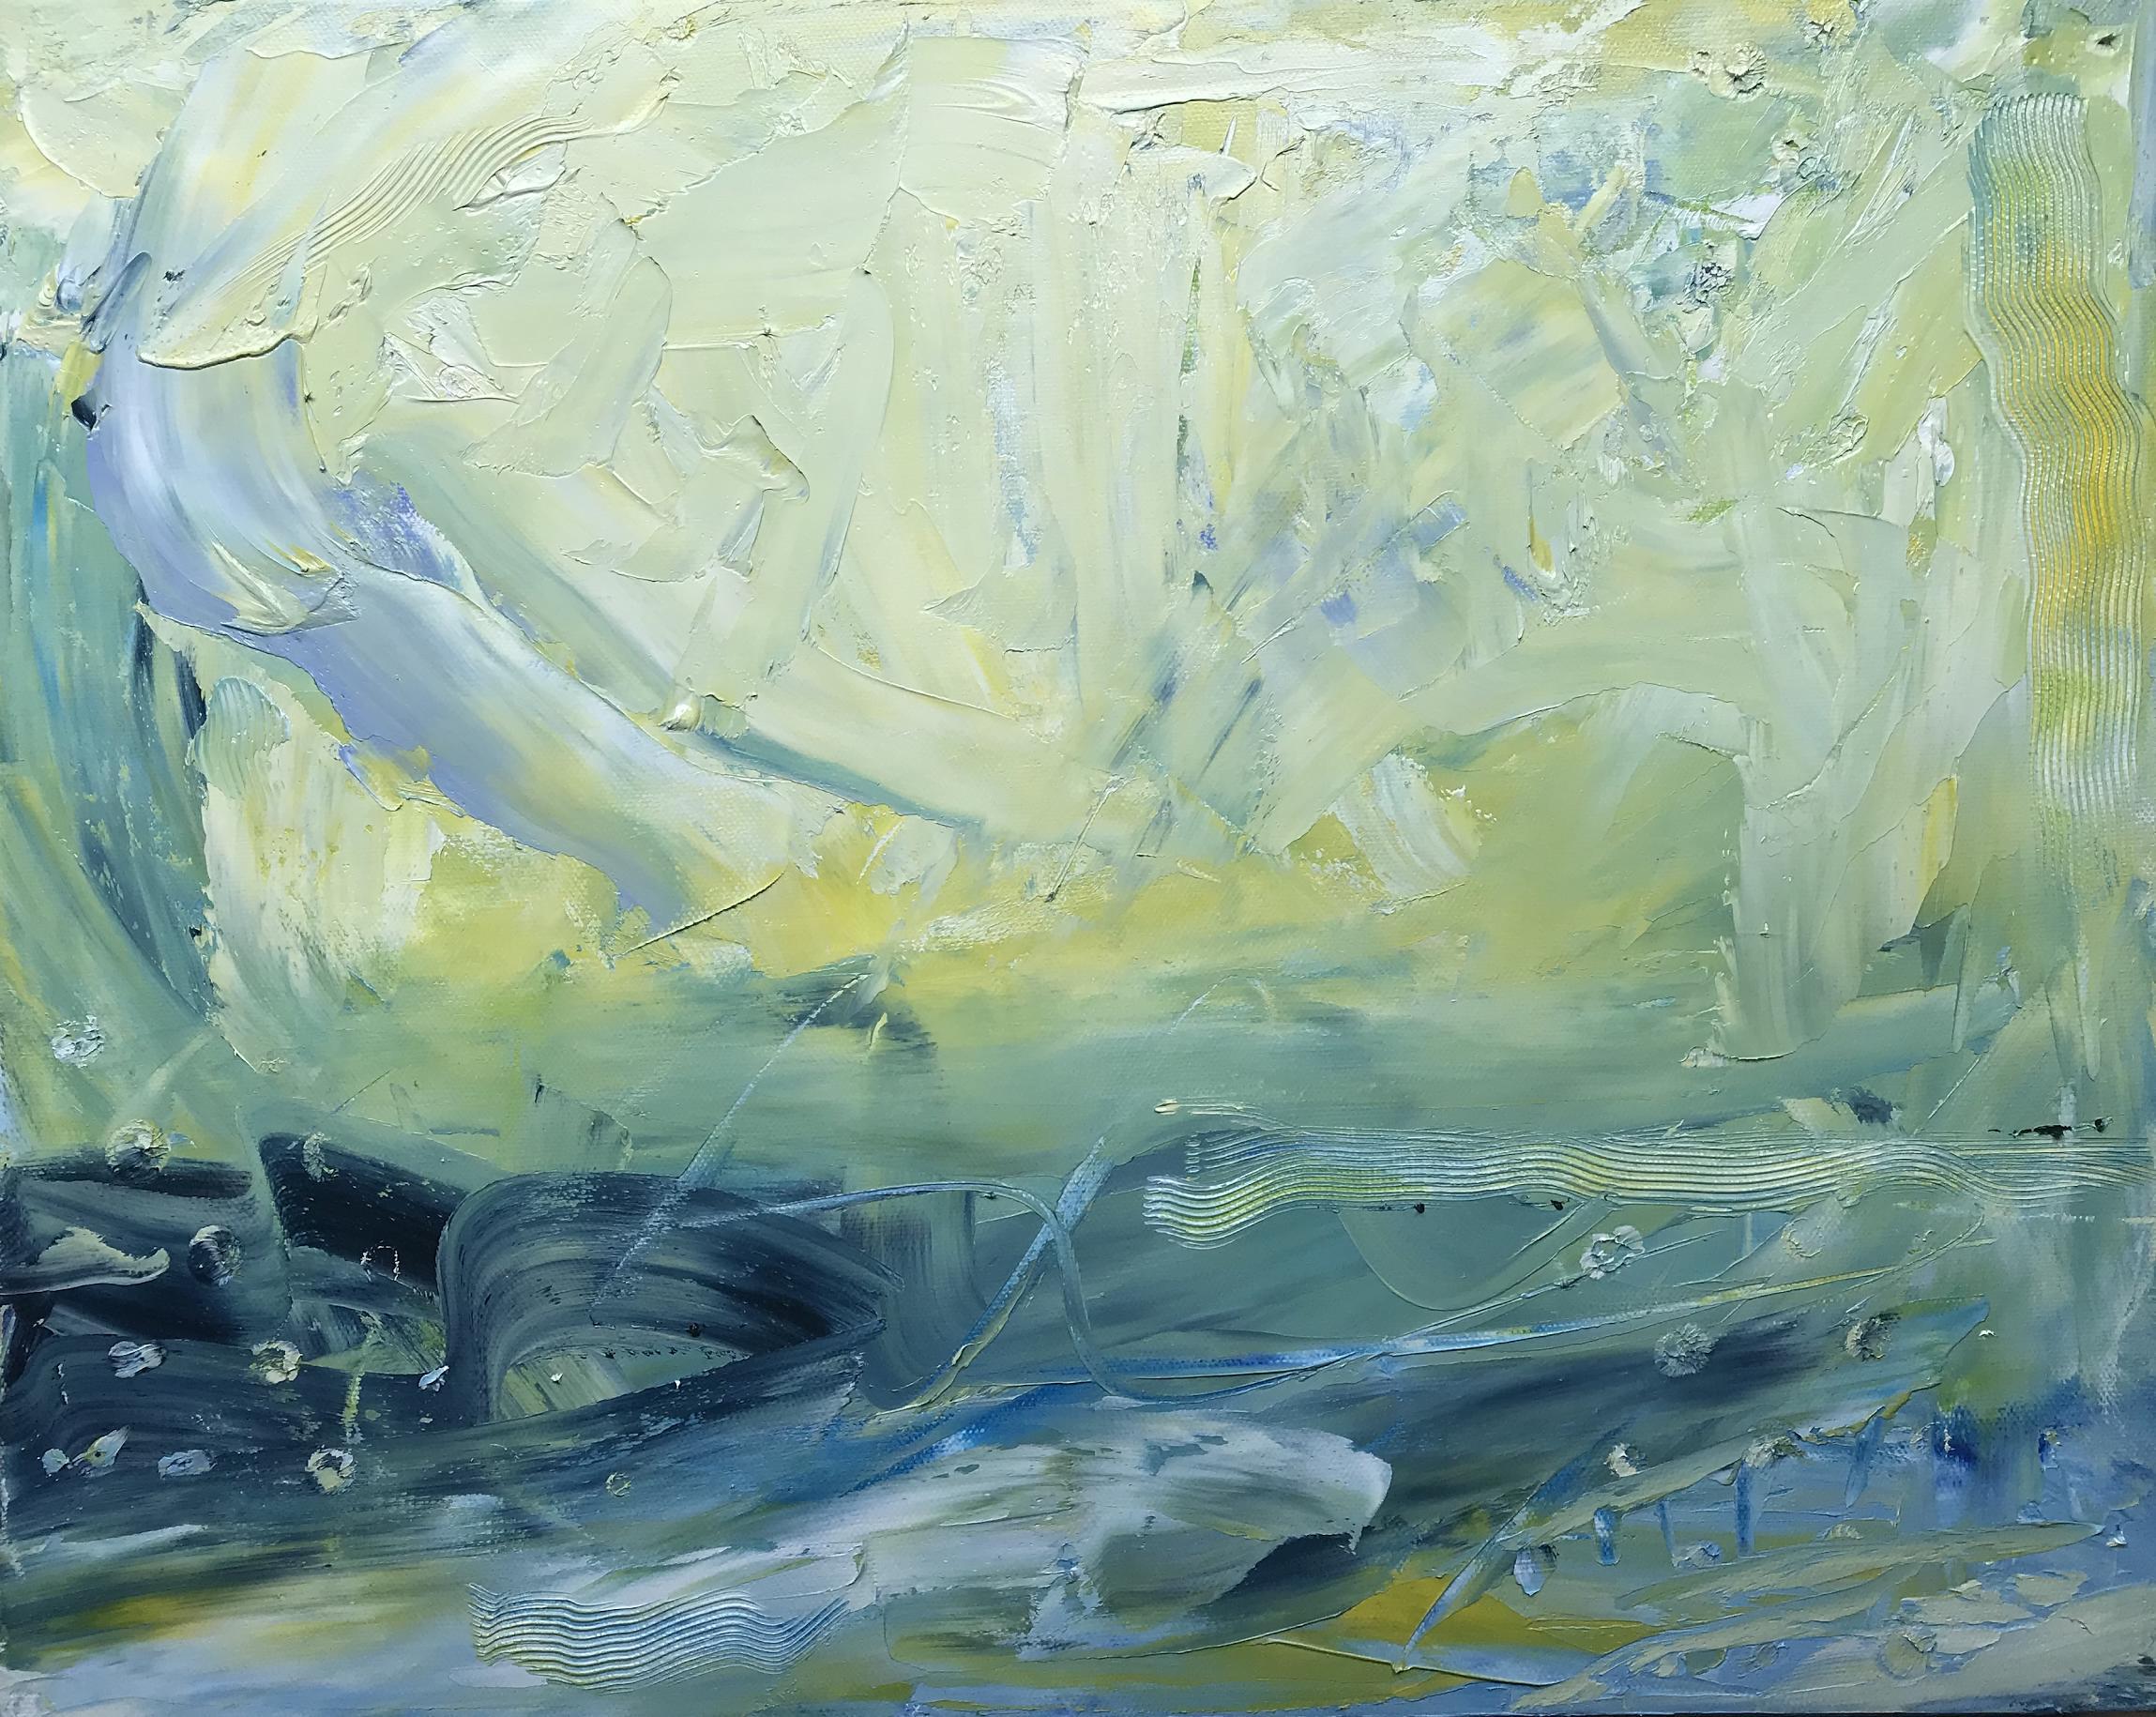 heart of the sea, 16x20, starting bid $275 -